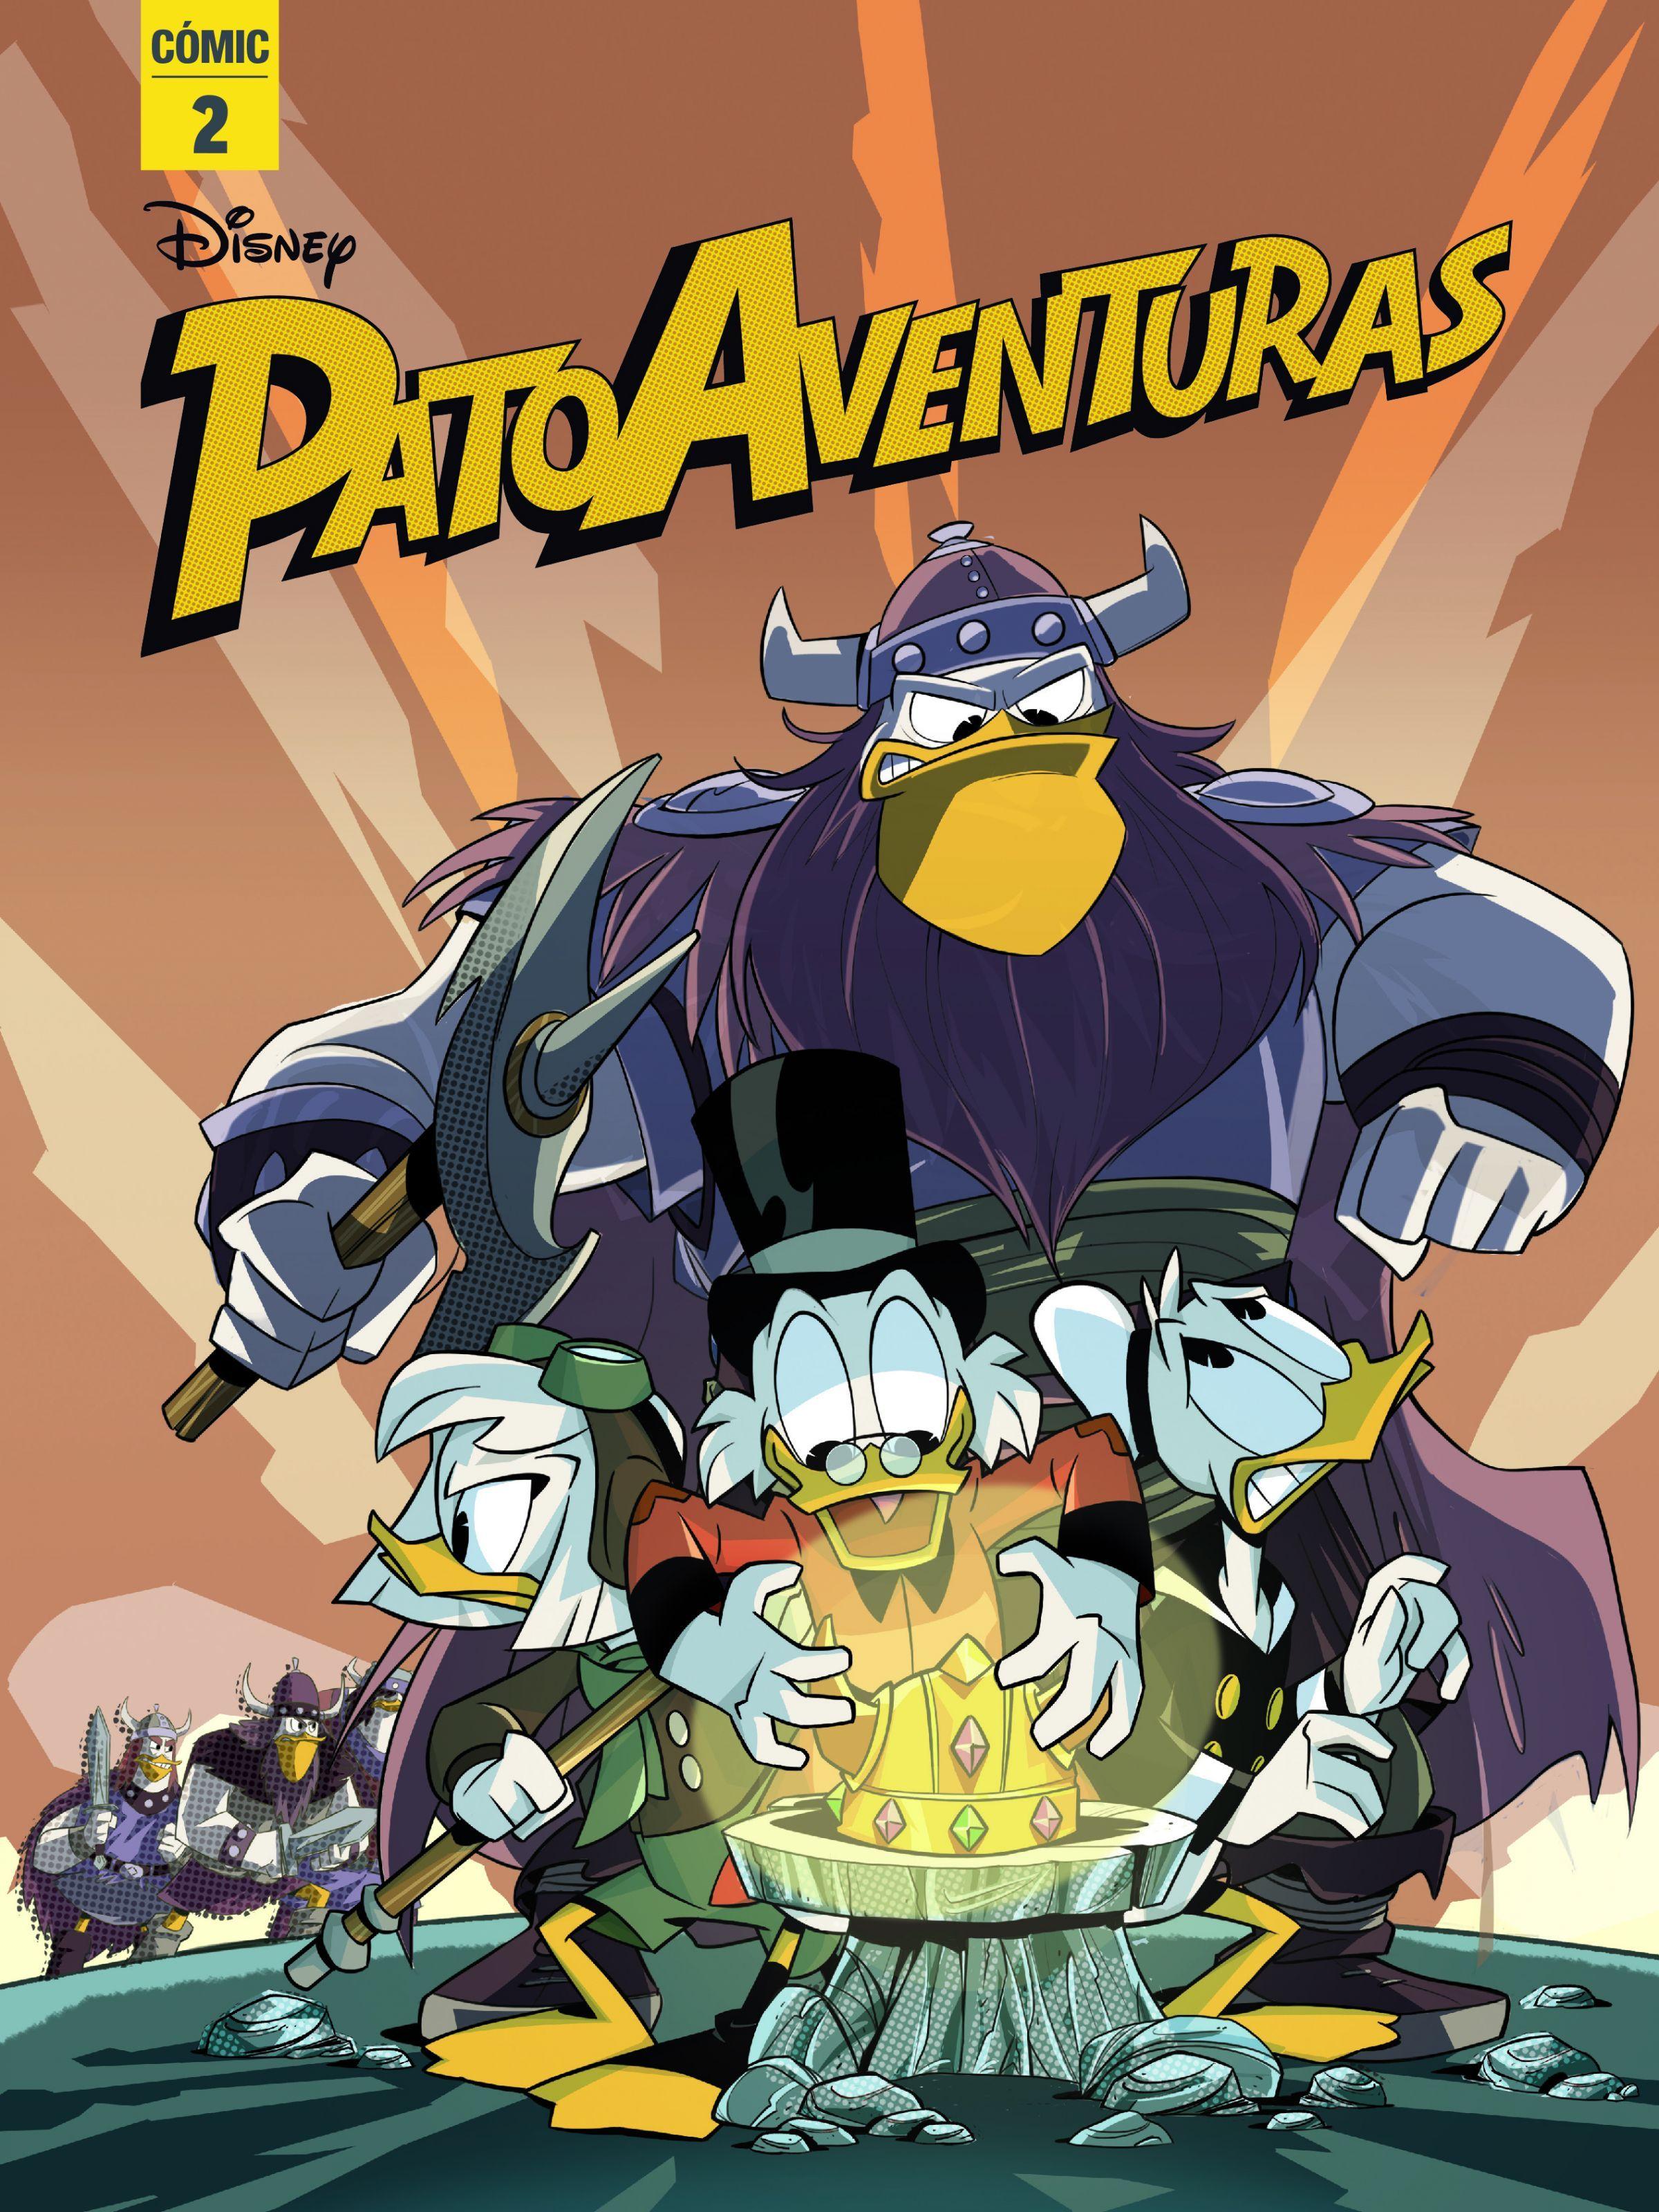 Patoaventuras 2 - Disney - Planeta Junior